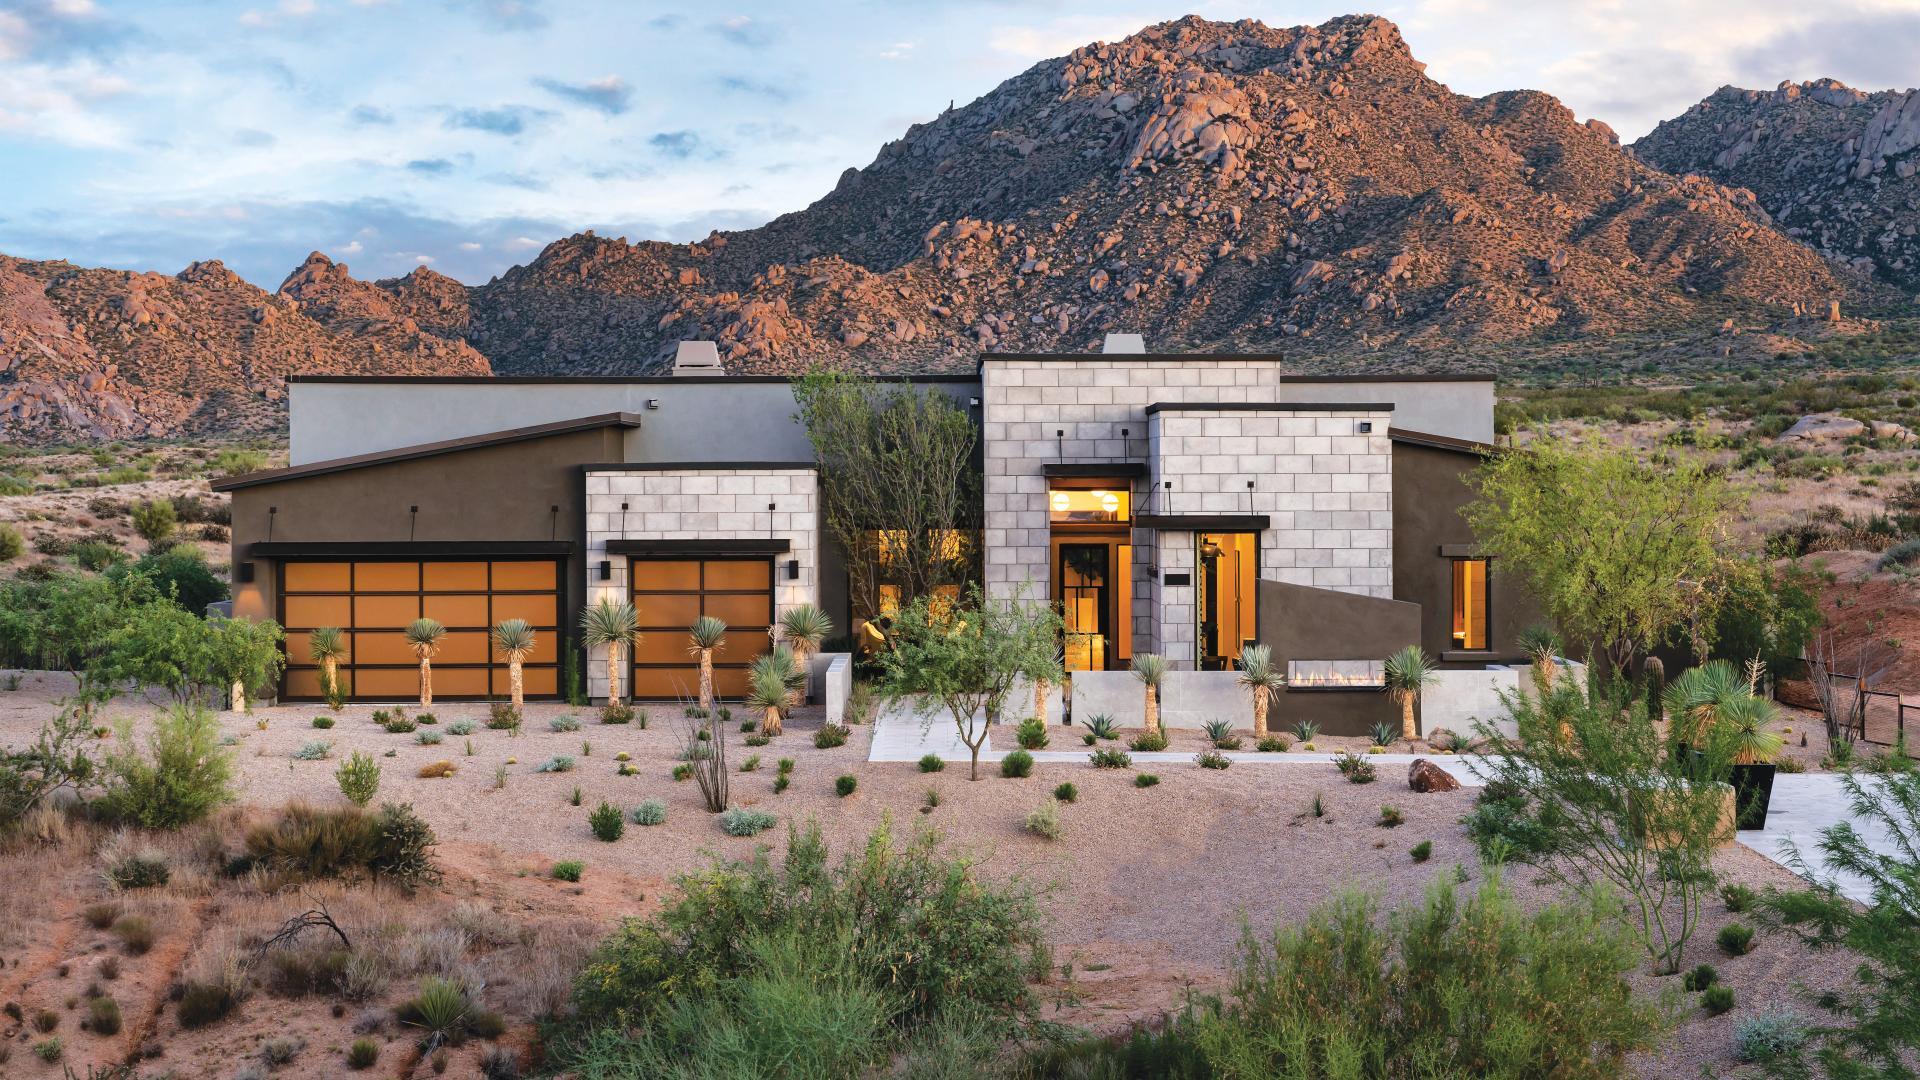 Award-winning home designs with beautiful mountain views